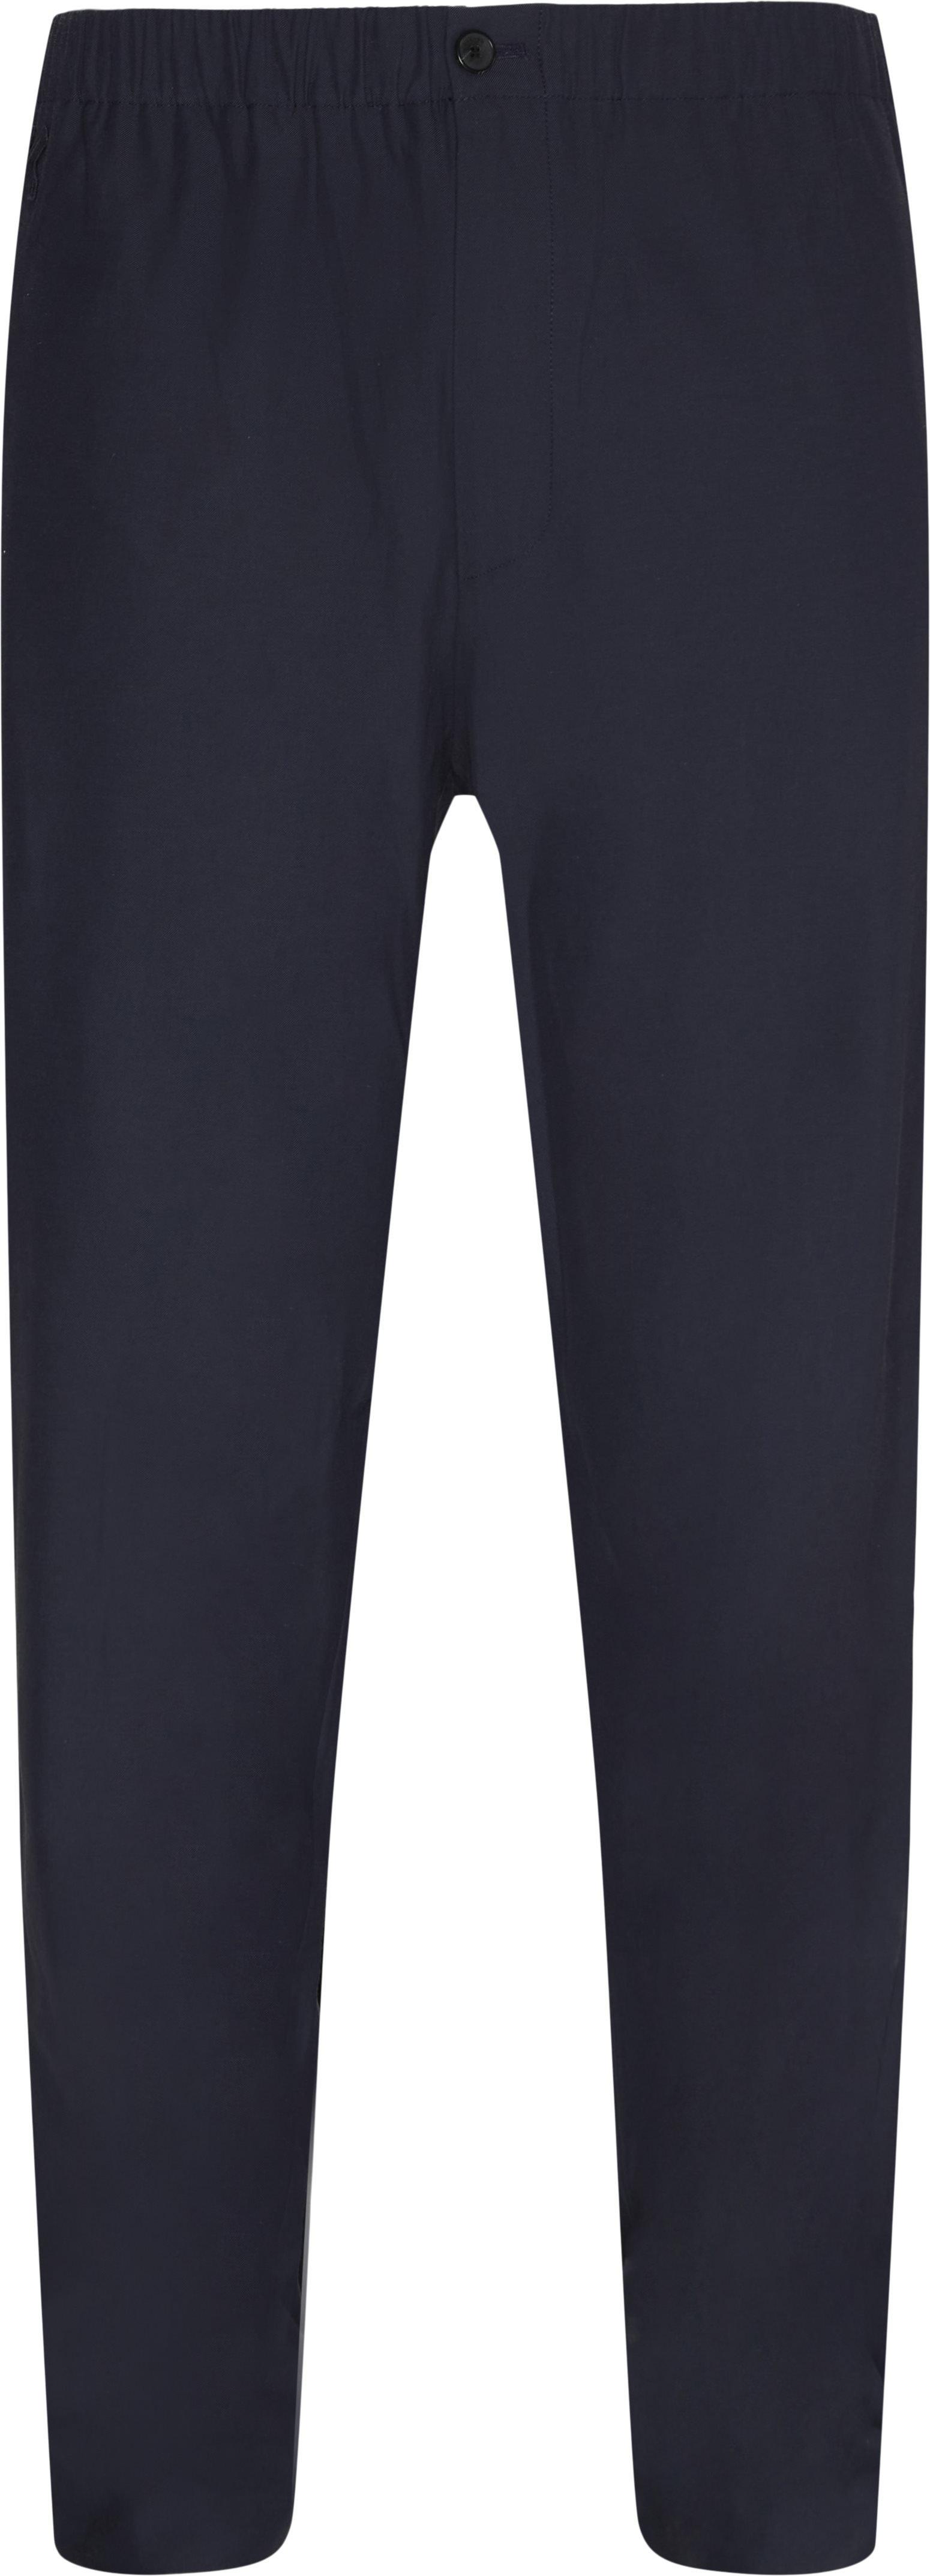 Bukser - Bukser - Loose fit - Blå